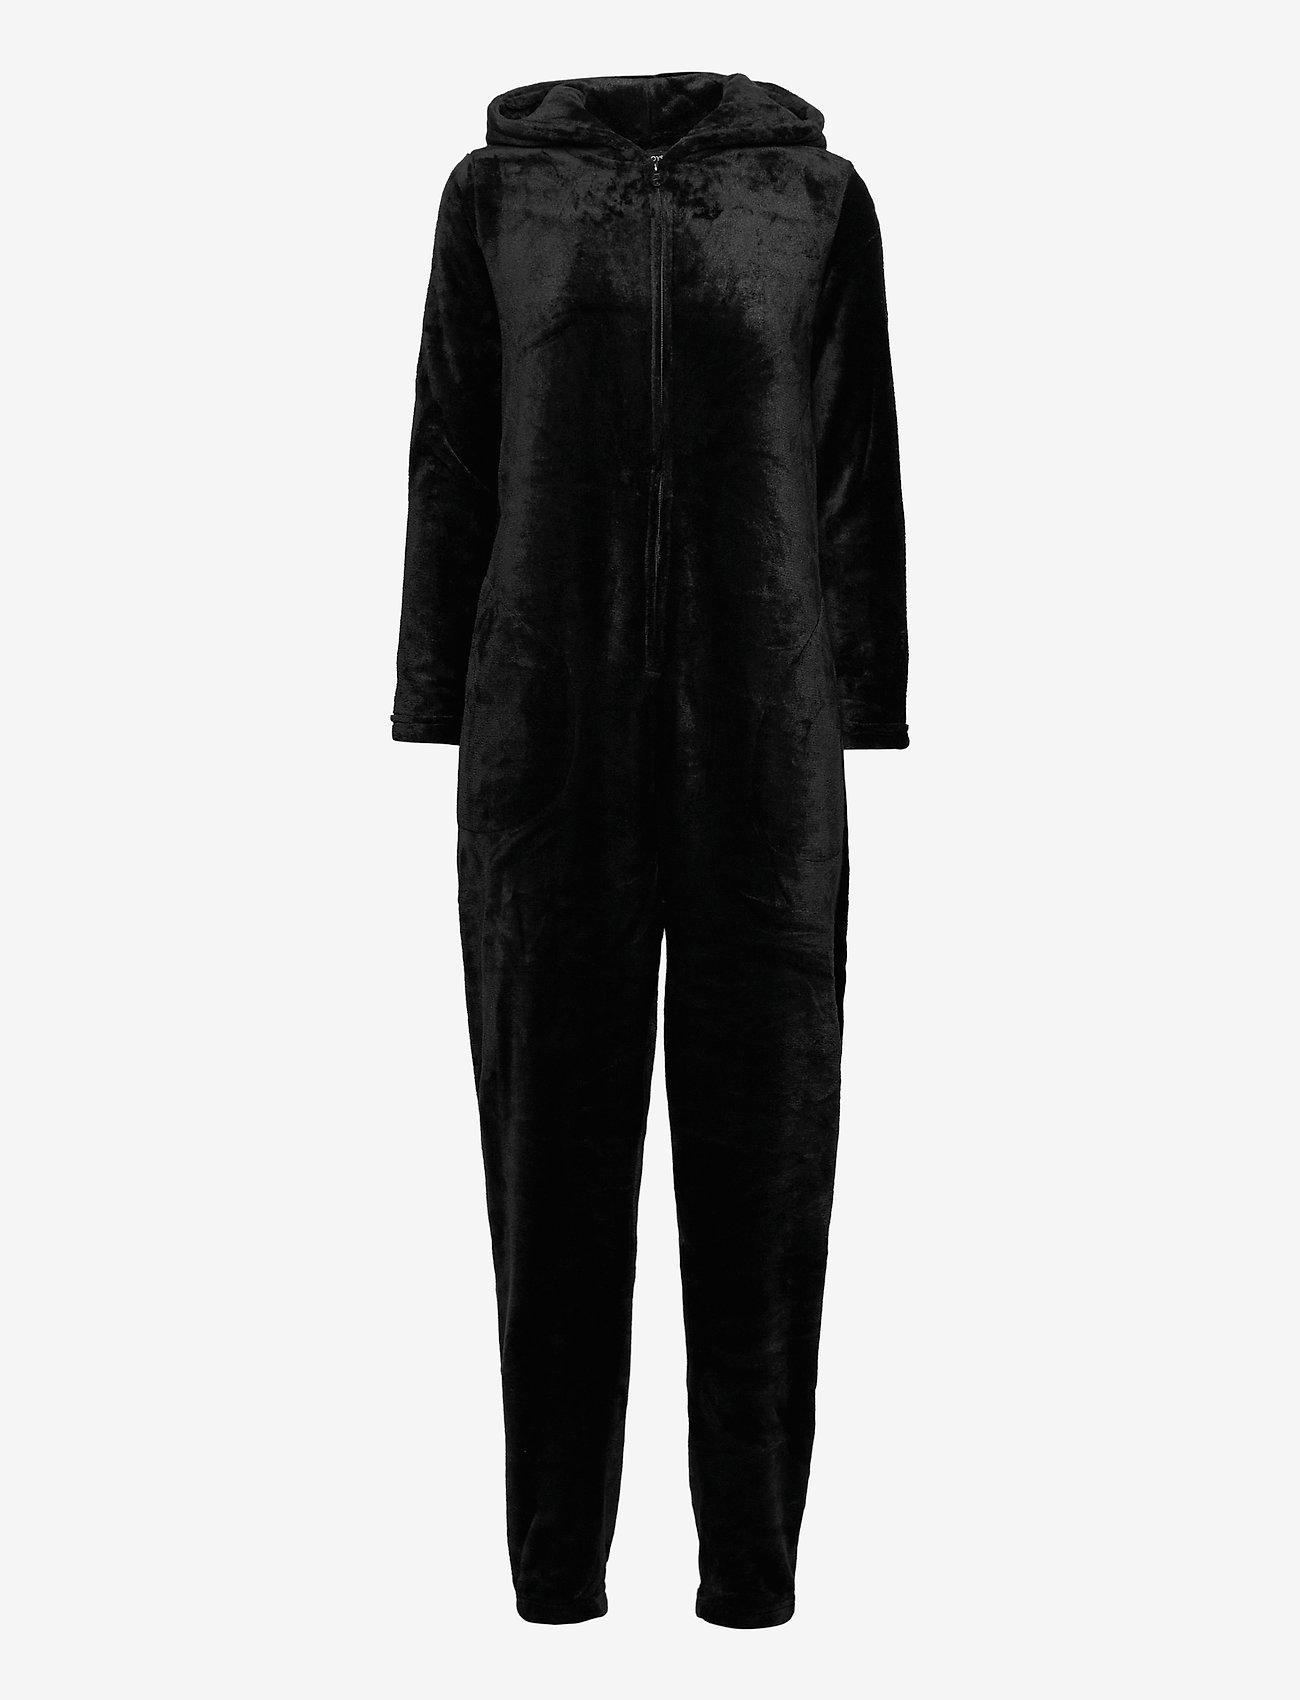 Decoy - DECOY onepiece w/hood, zipper - pyjama''s - svart - 0